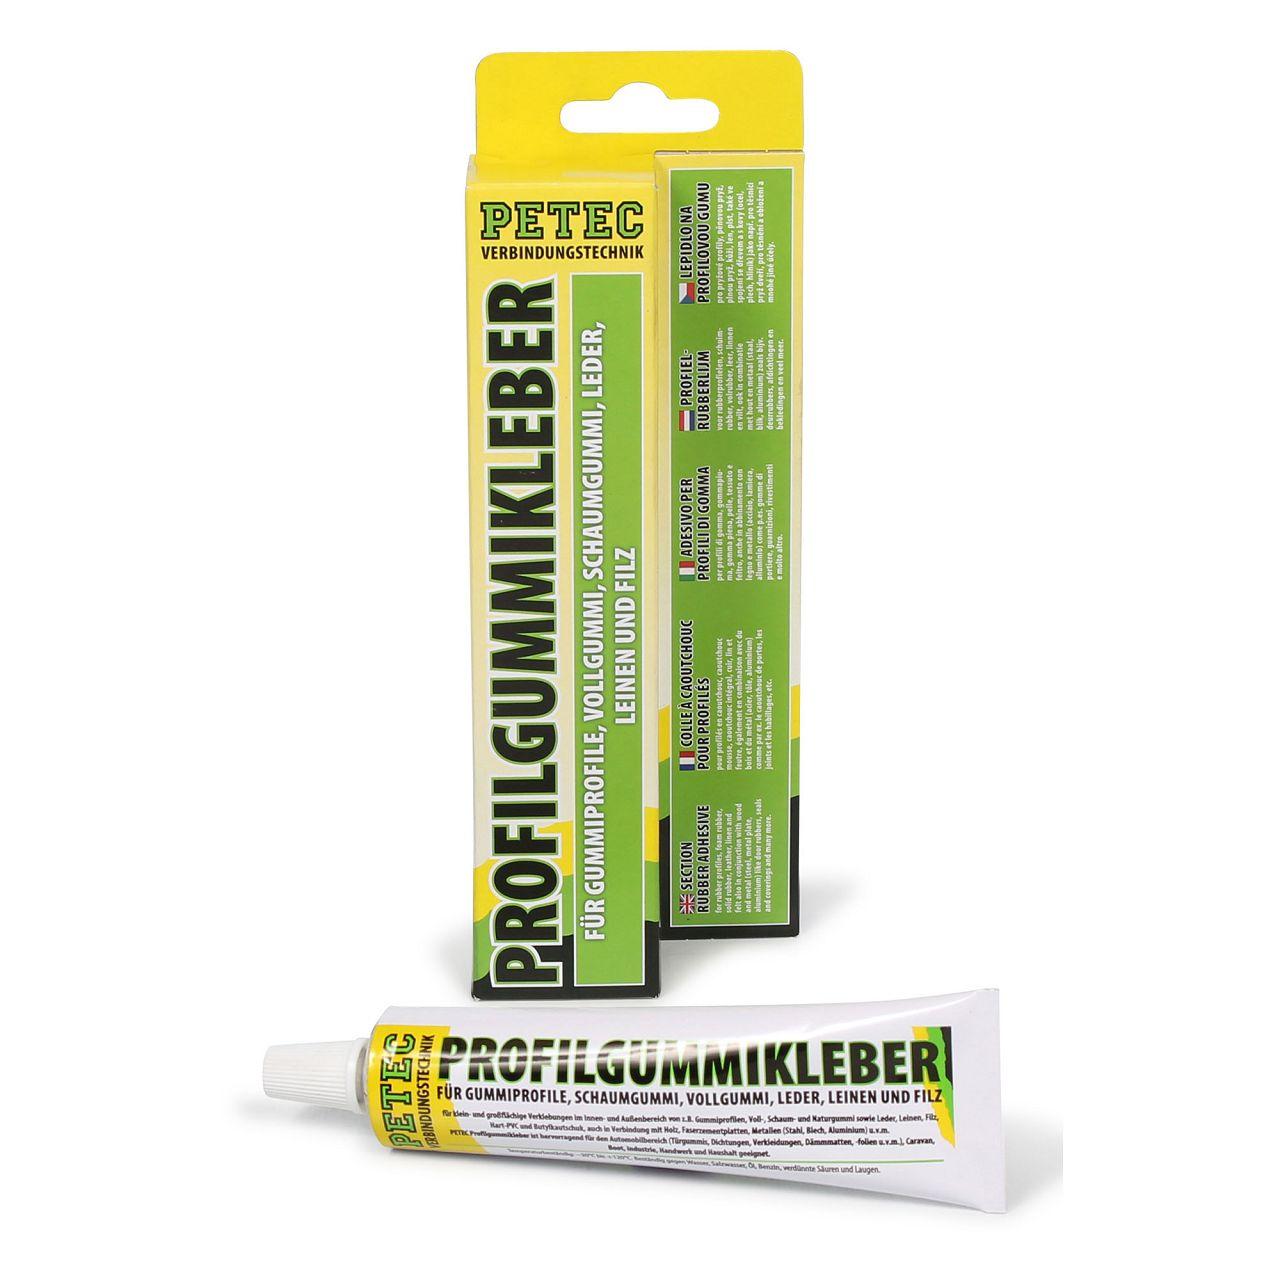 PETEC 93870 Profilgummikleber Gummiklebstoff Kleber Klebstoff 70ml